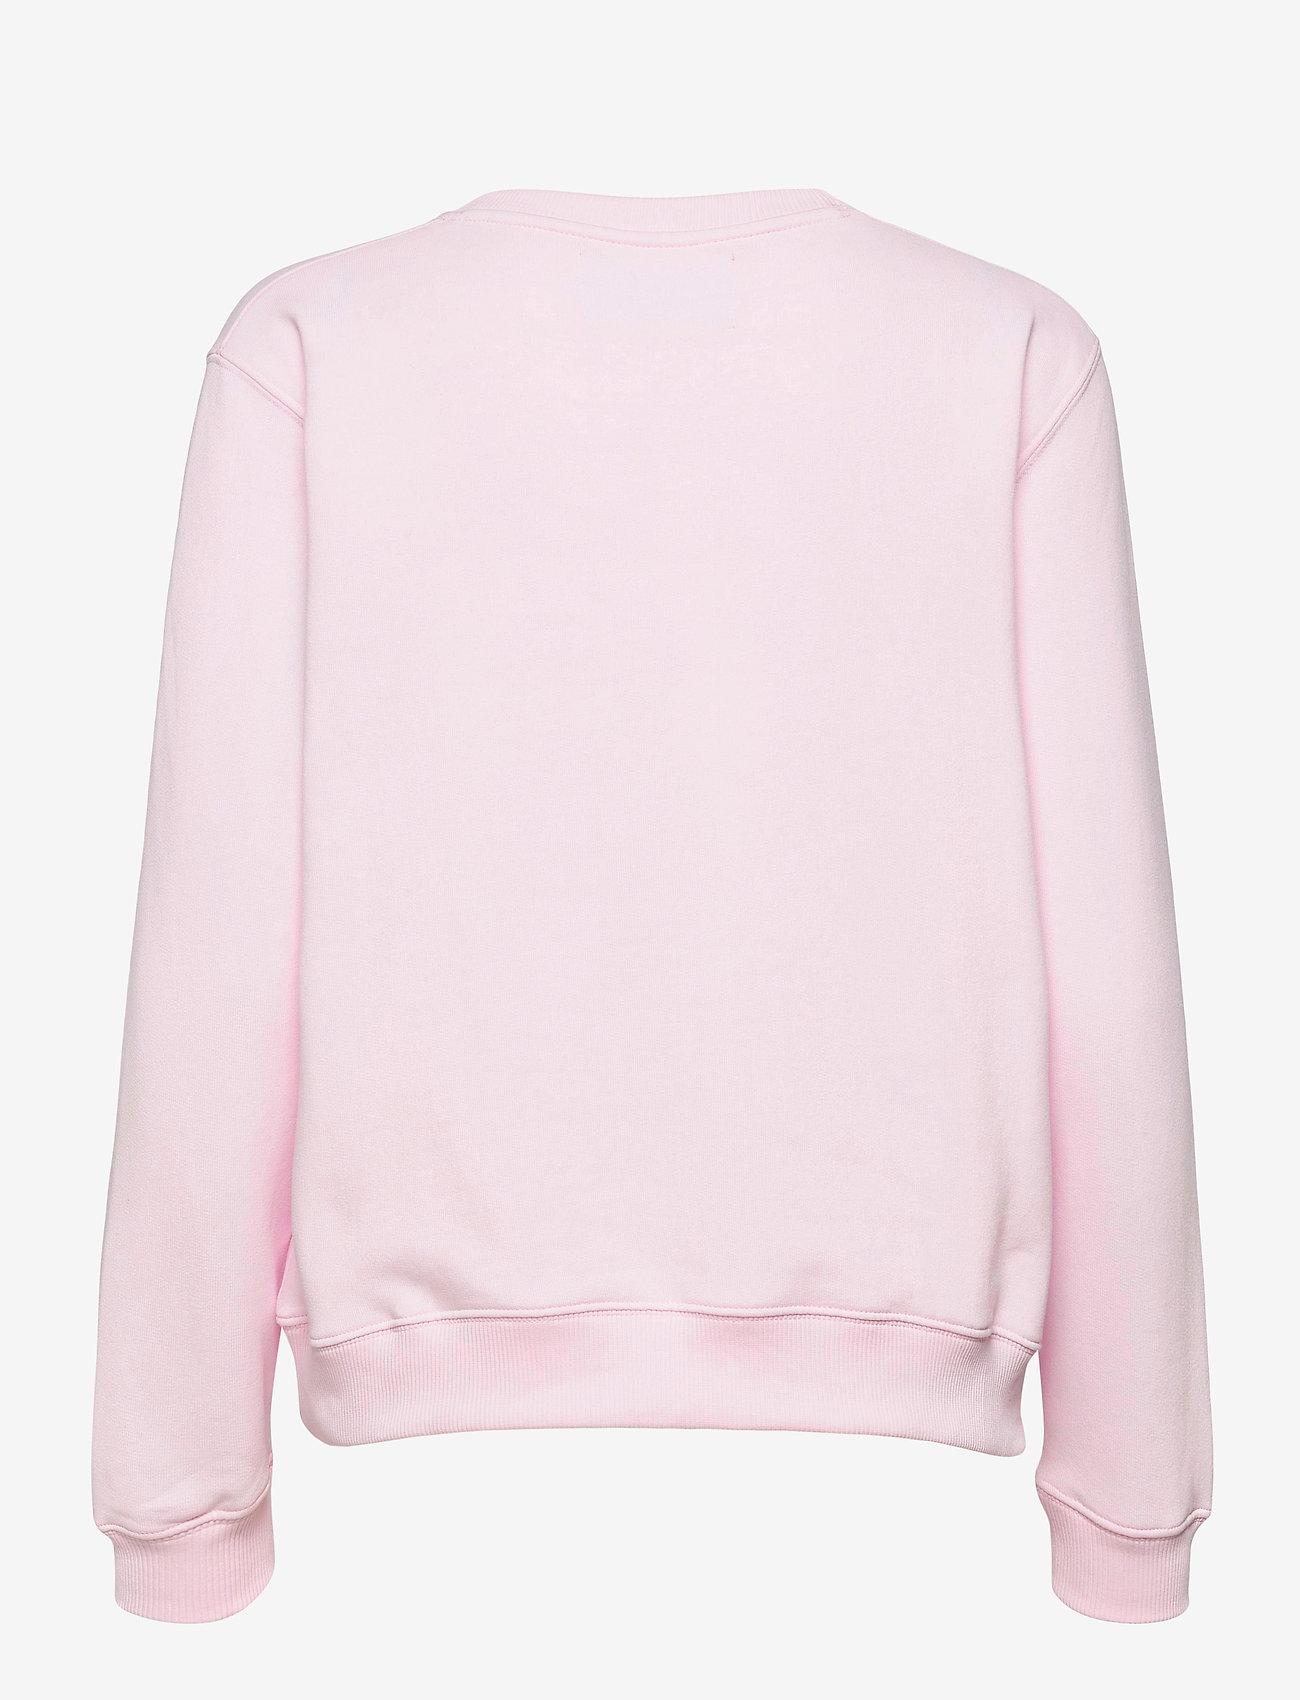 Calvin Klein Jeans - MONOGRAM LOGO CREW NECK - sweatshirts - pearly pink/quiet grey - 1